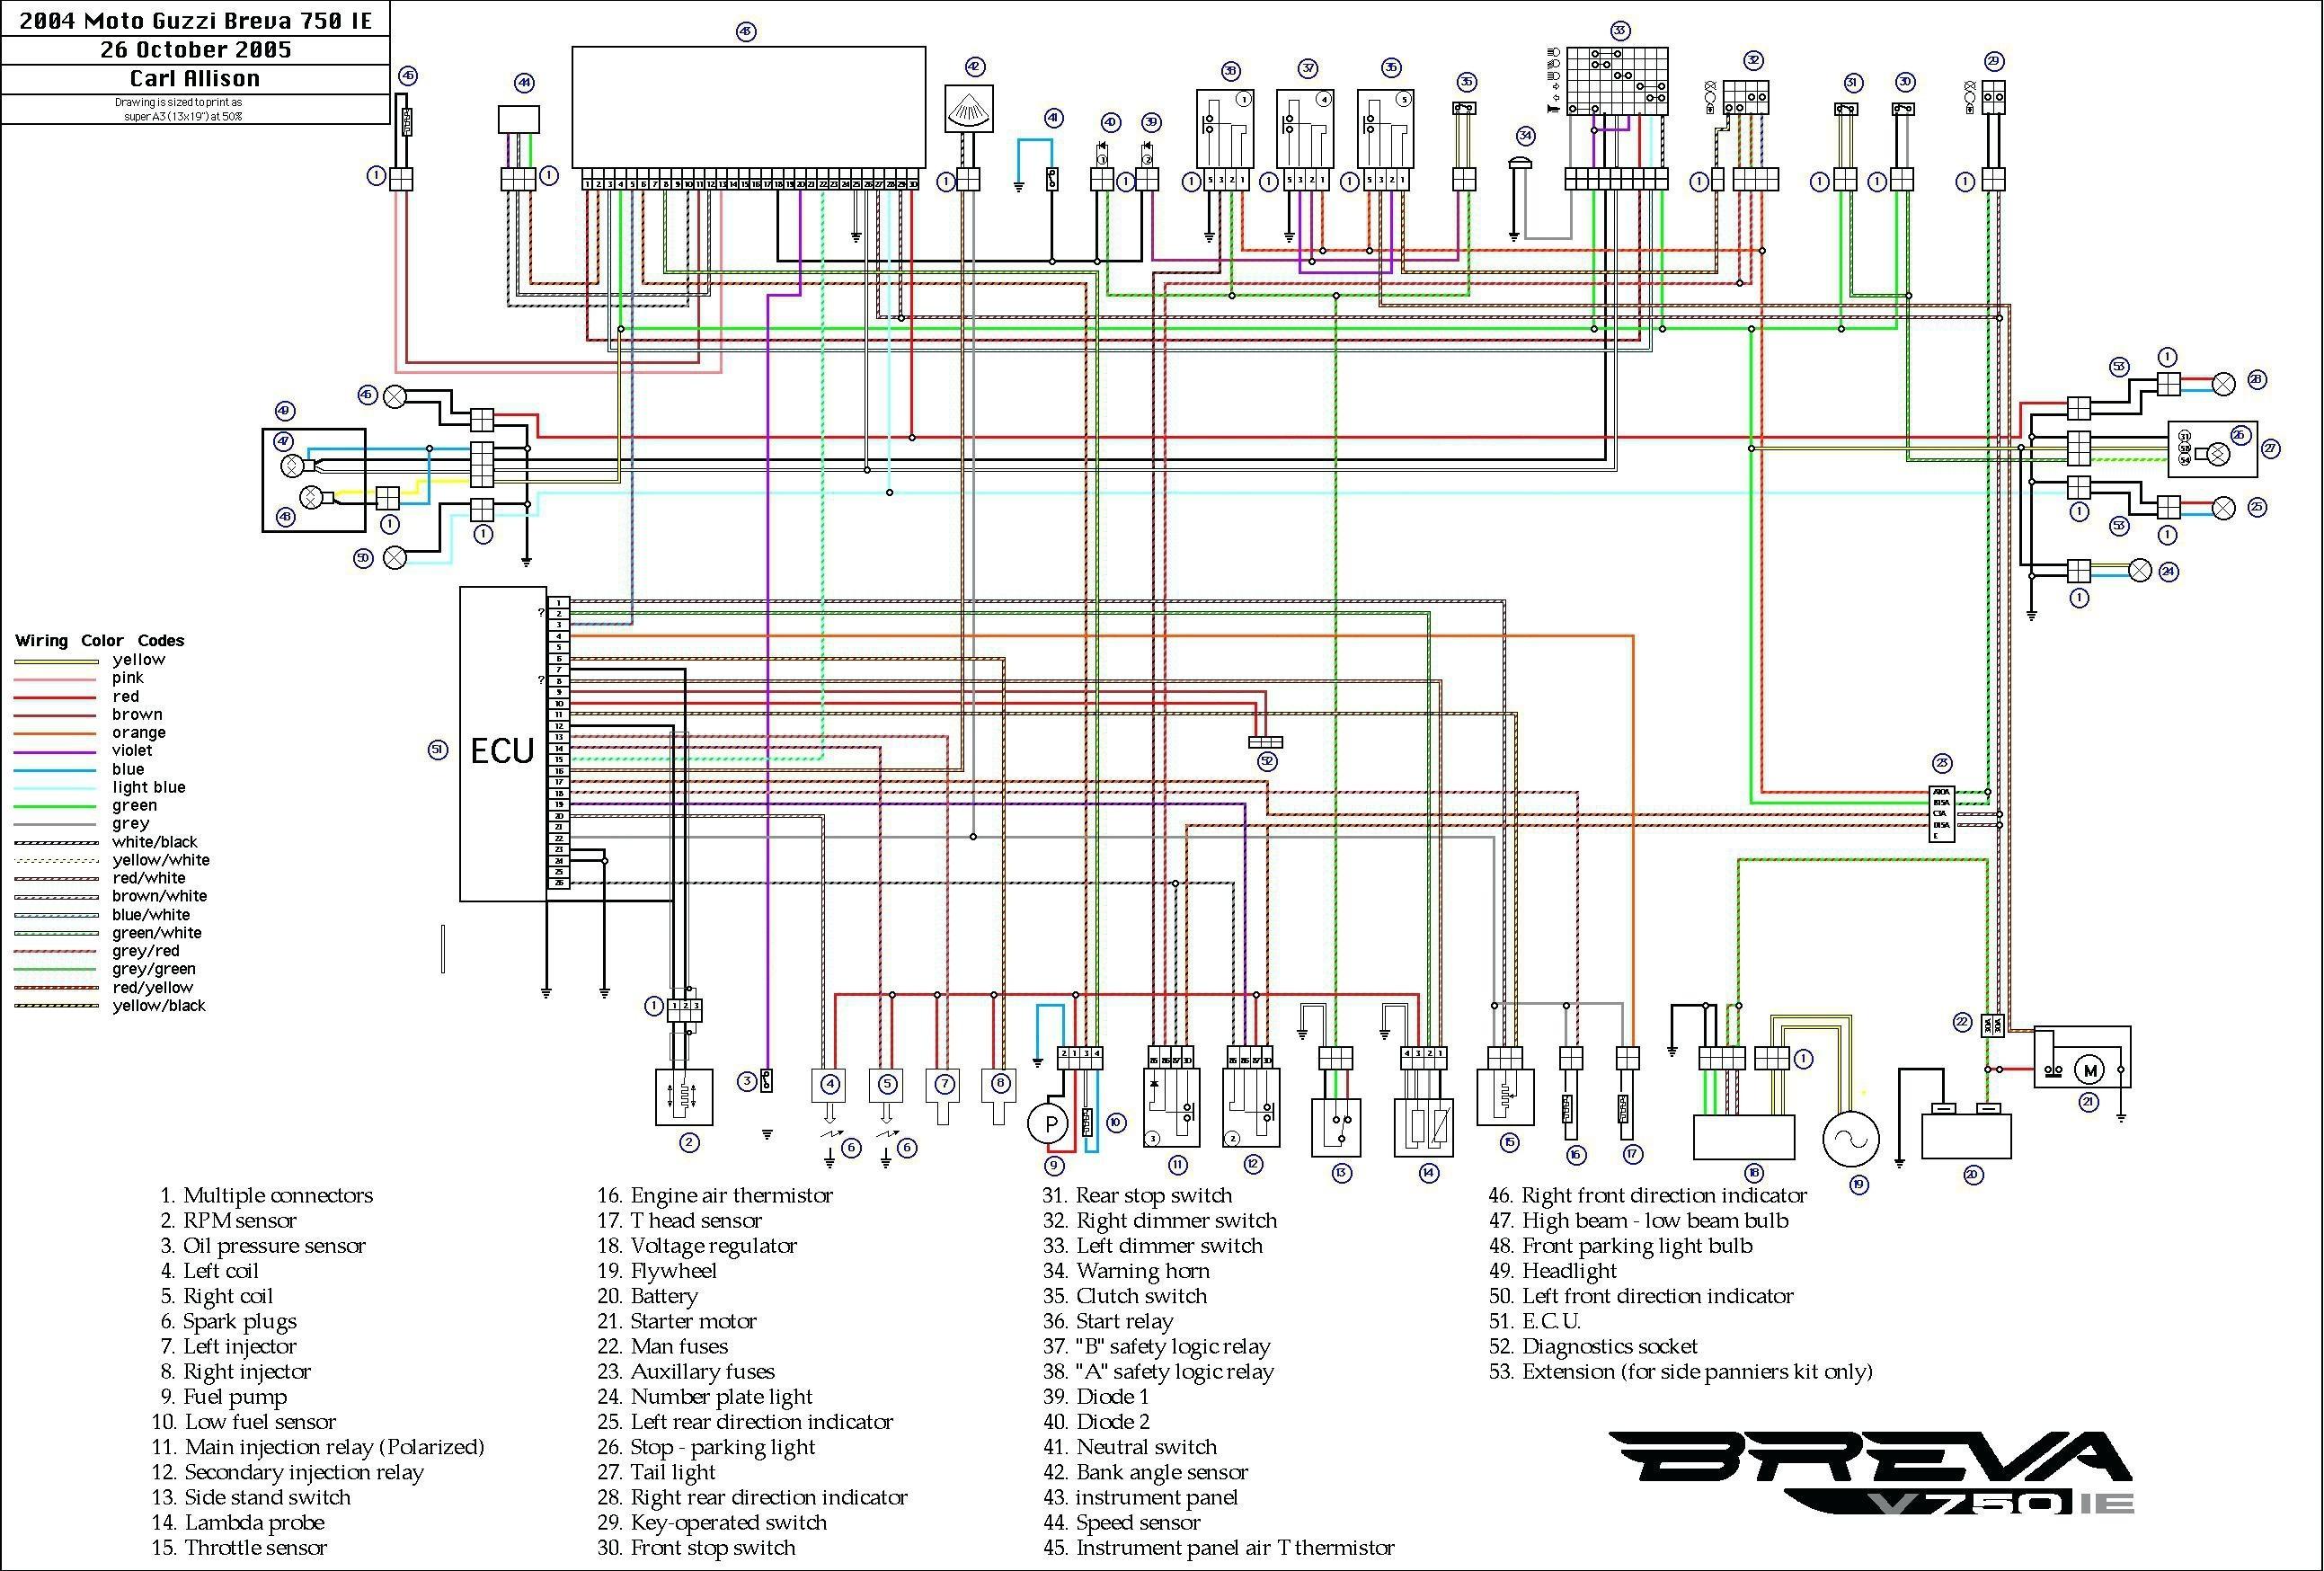 dodge 3500 wiring diagram free image about wiring diagram wire rh rkstartup co